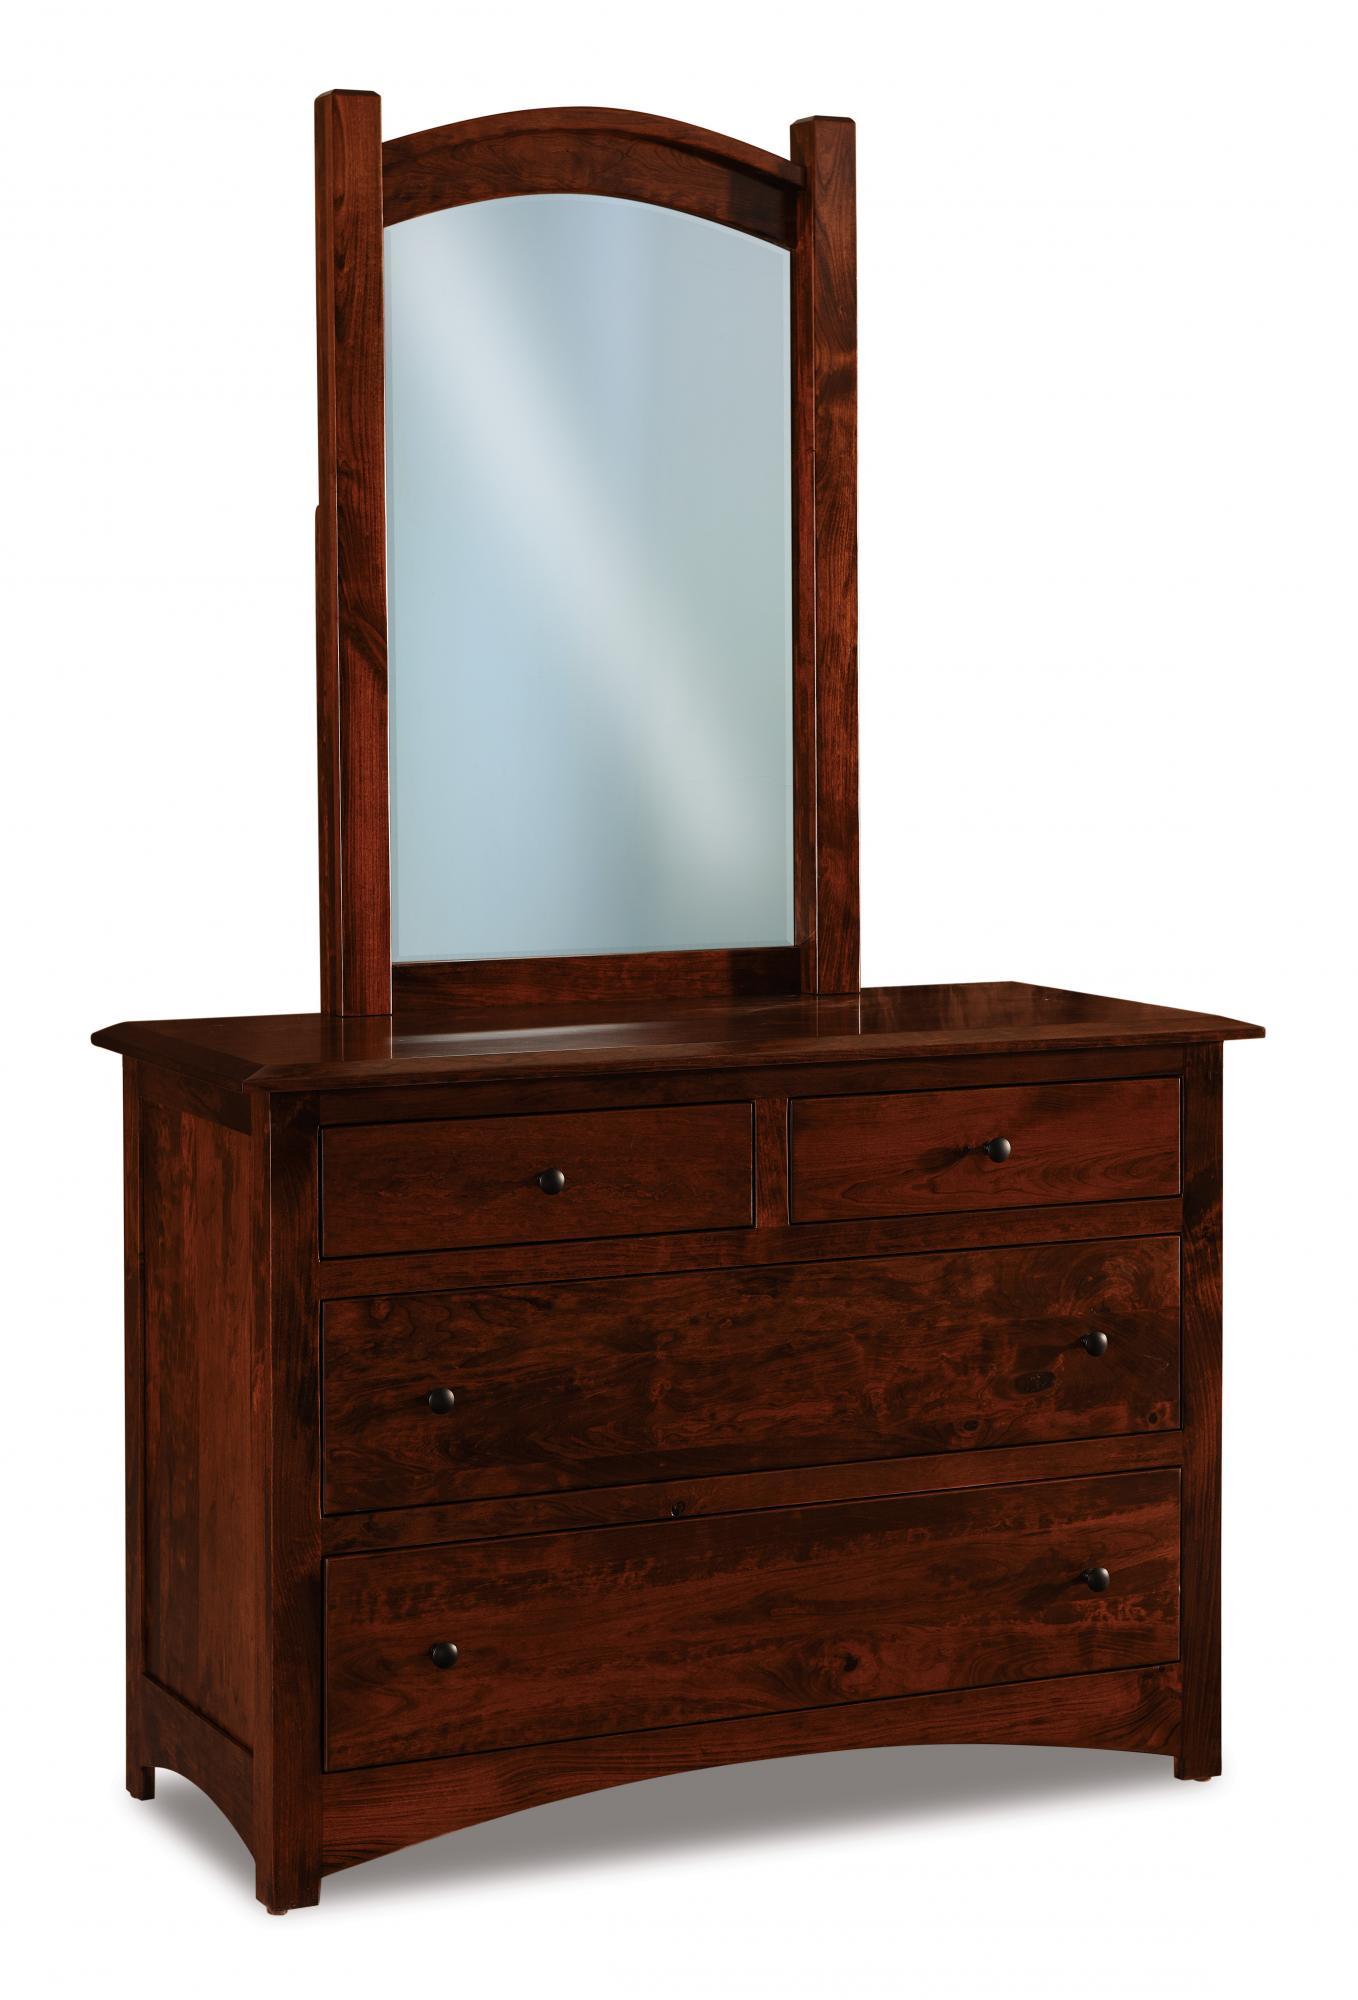 19 mankato furniture 4 drawer dresser amish furniture store